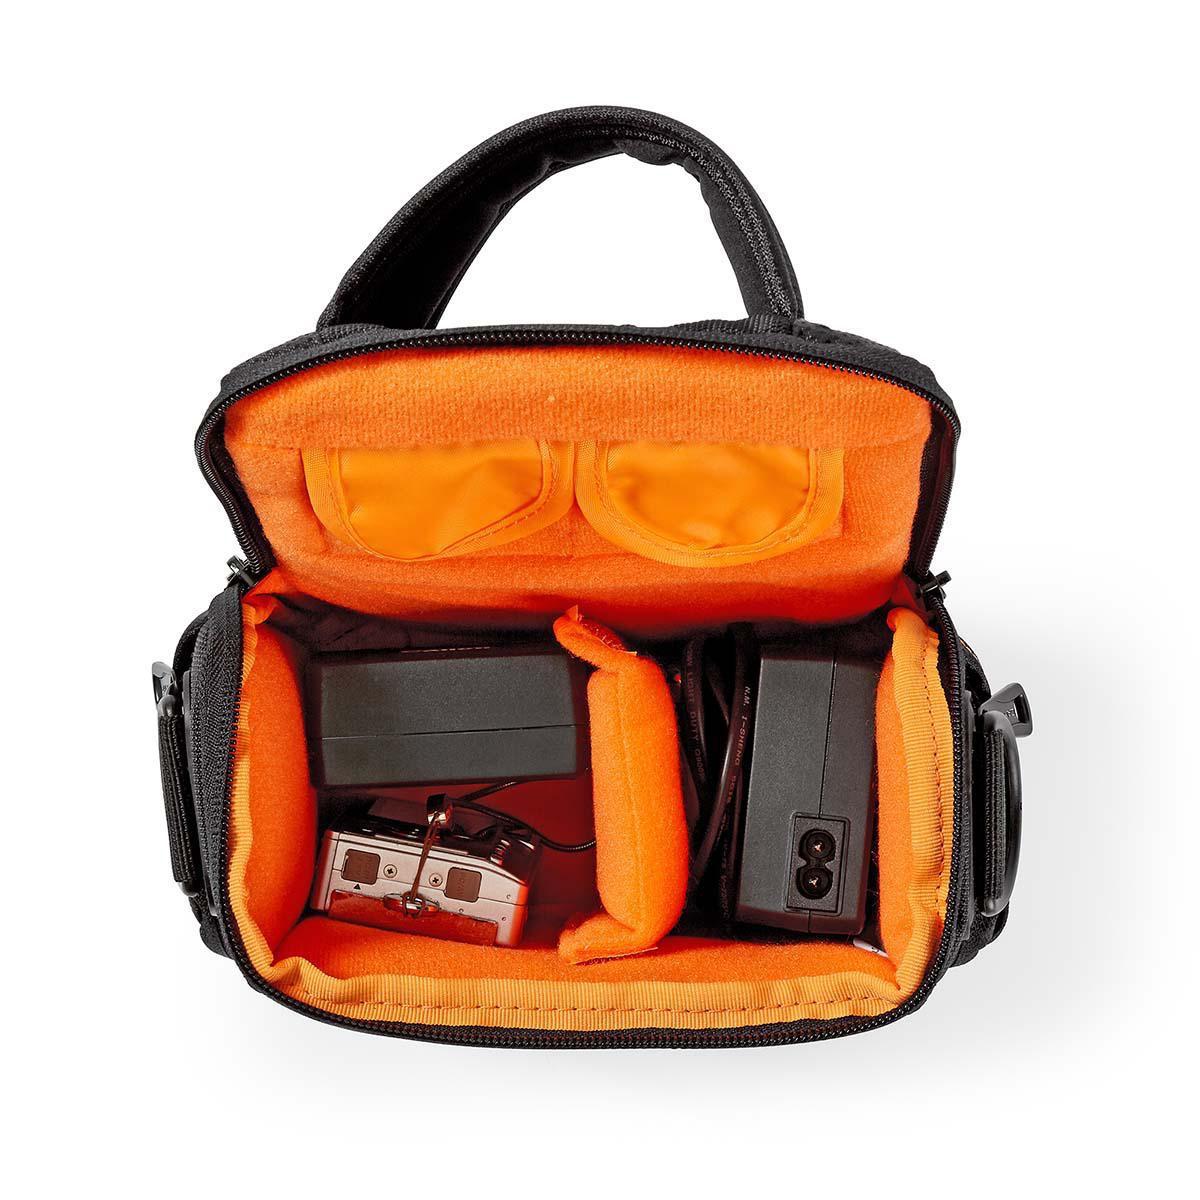 Camera-schoudertas152 x 146 x 65 mm 2 binnenvakken